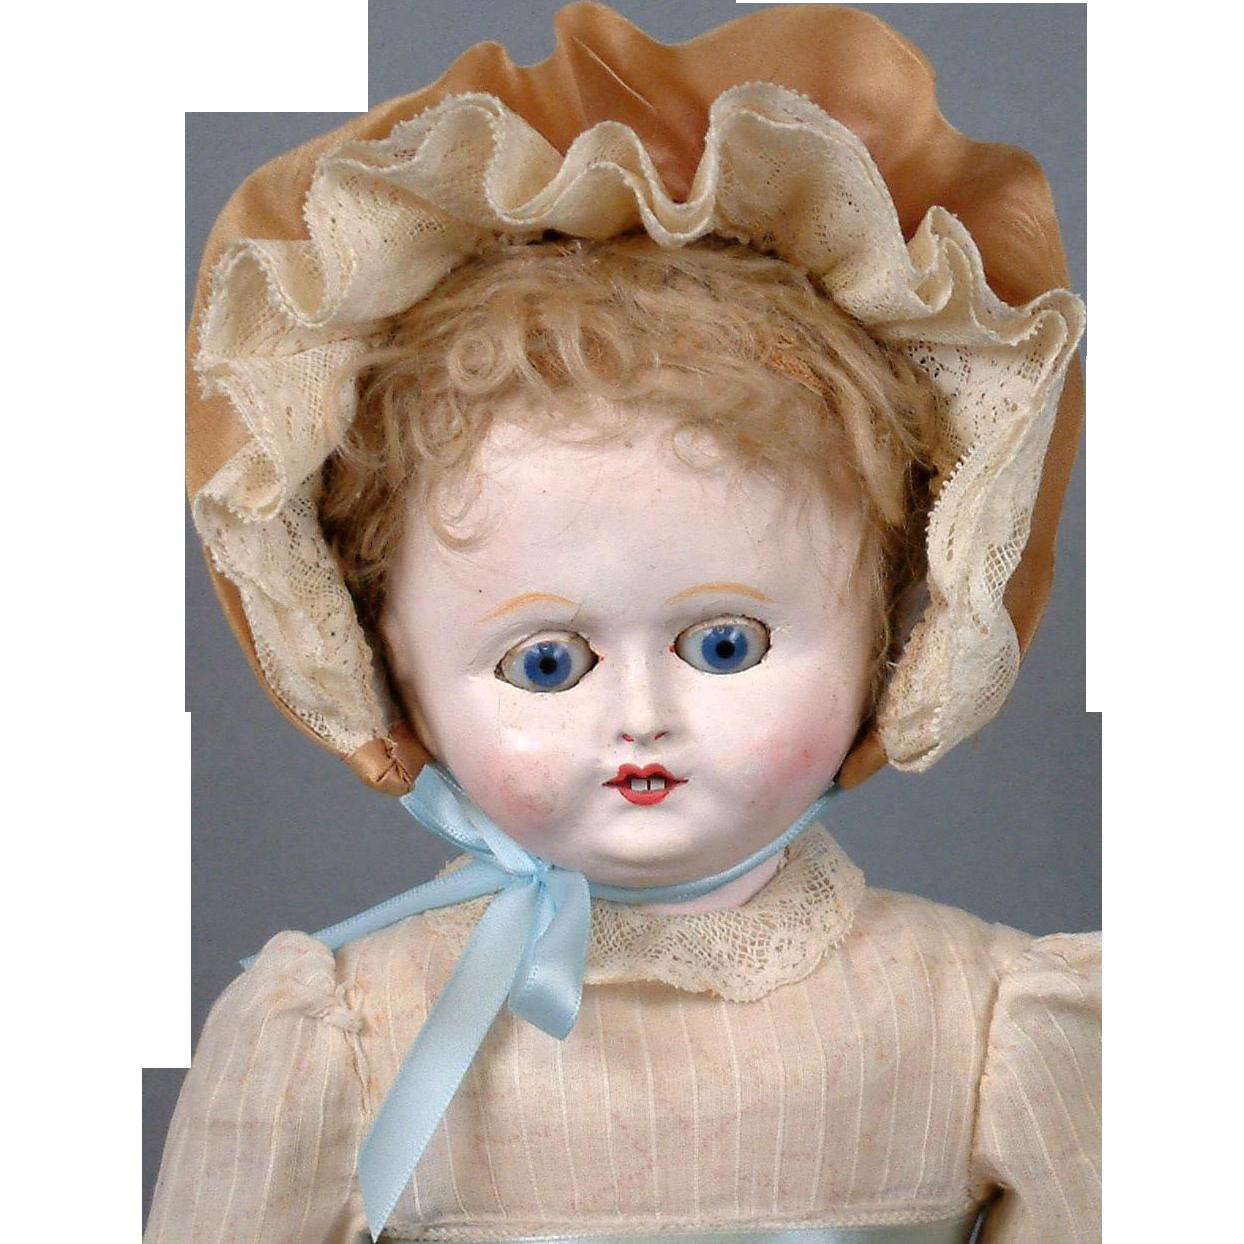 "Motschmann Antique Paper Mache Girl 13"" in Antique Dress with Blue Sleep Eyes"